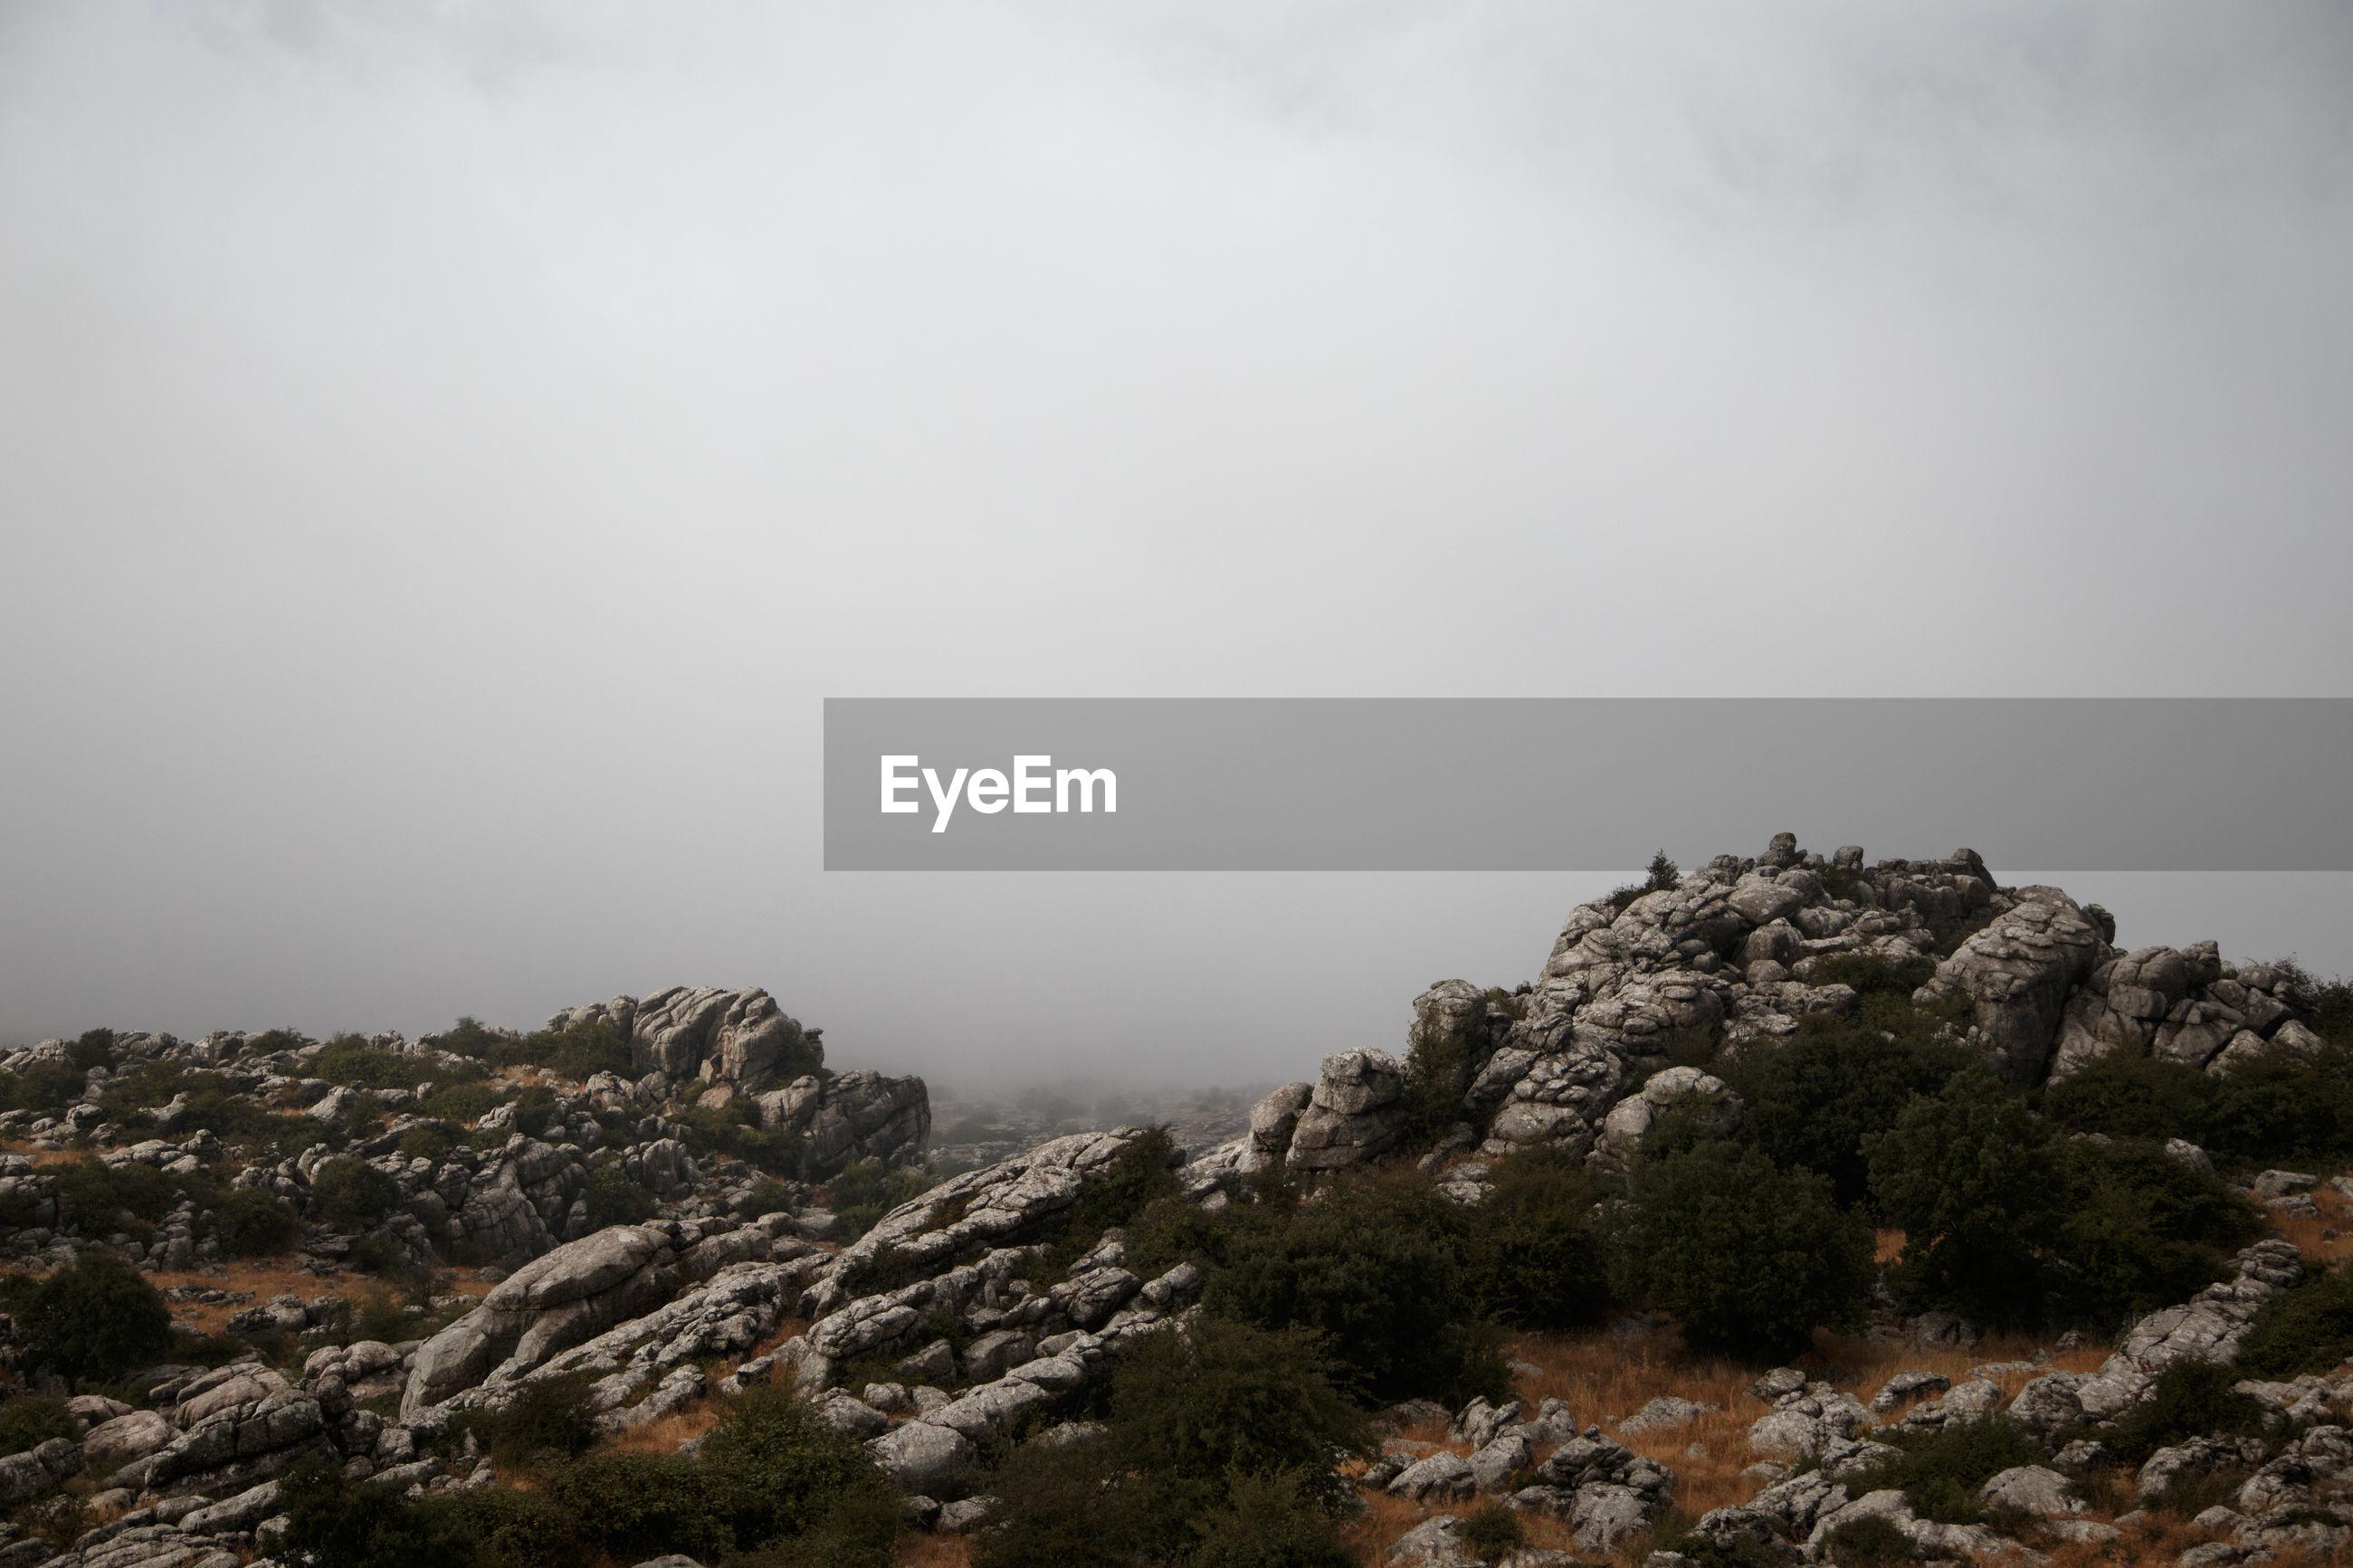 TREES ON ROCKY MOUNTAIN AGAINST SKY